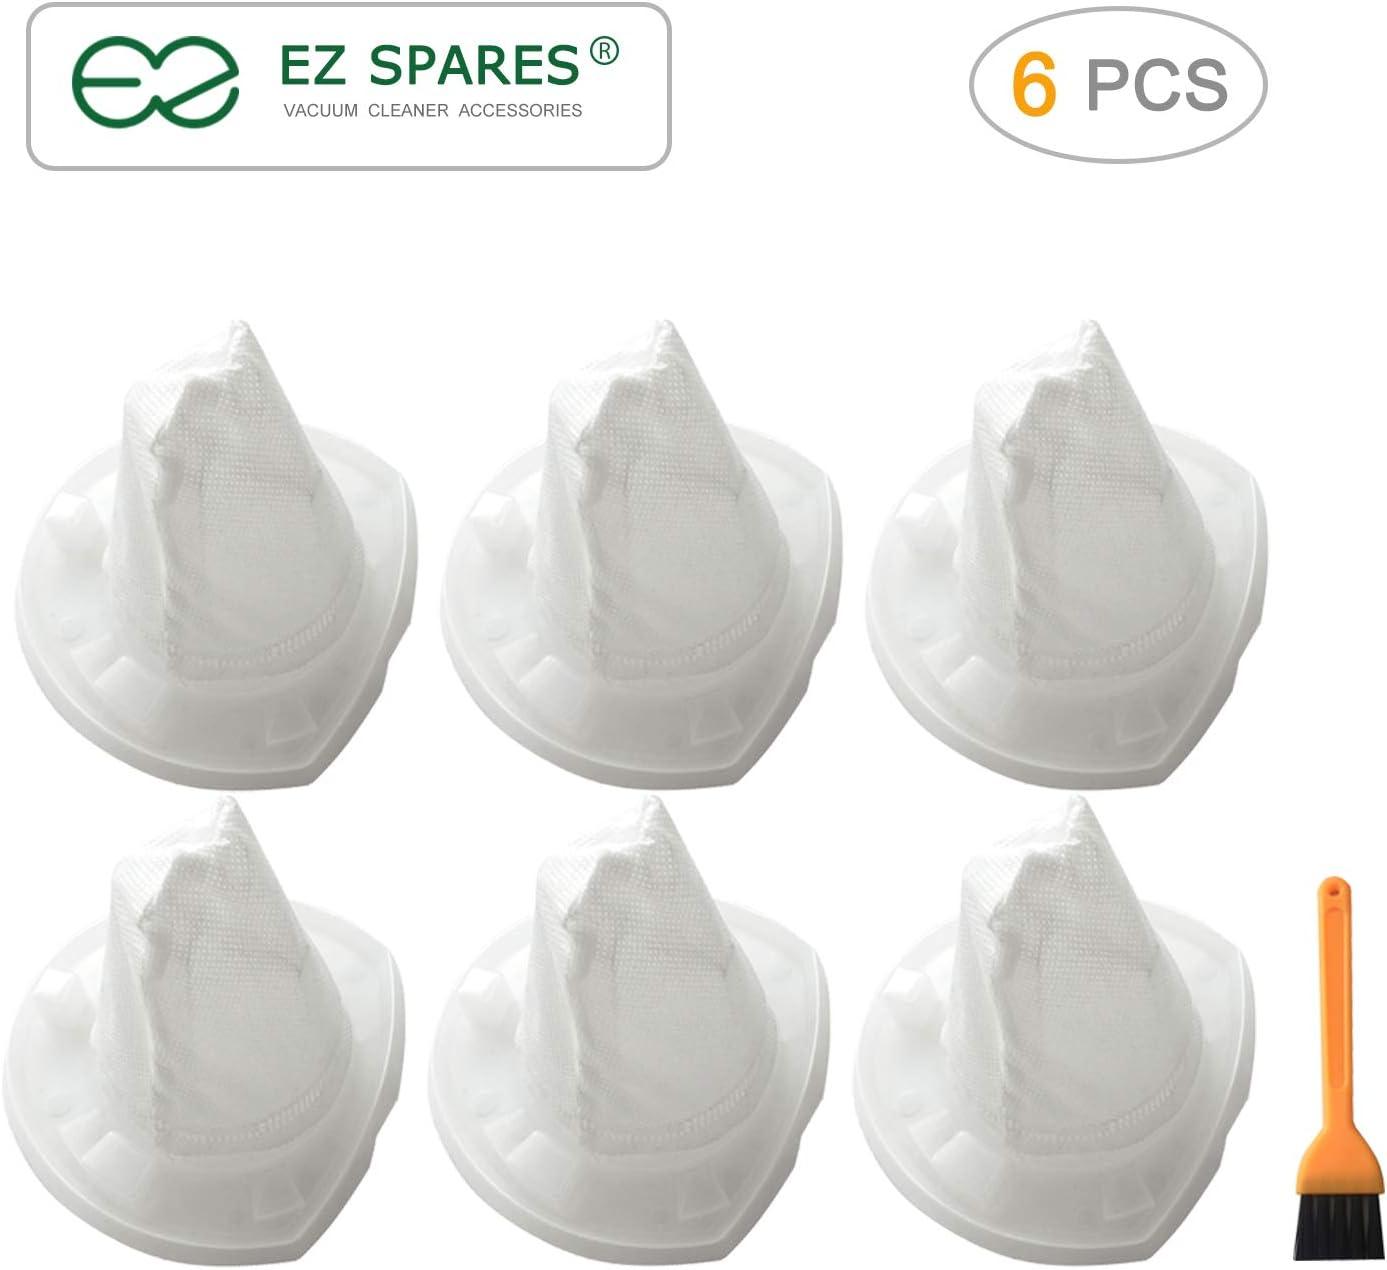 EZ SPARES Replacement for Filter,Black & Decker Filter,VF110 90558113 R CHV1410L CHV1510 CHV9610 CHV1210 CHV1410 CHV1410B BDH2000L(6PCS)